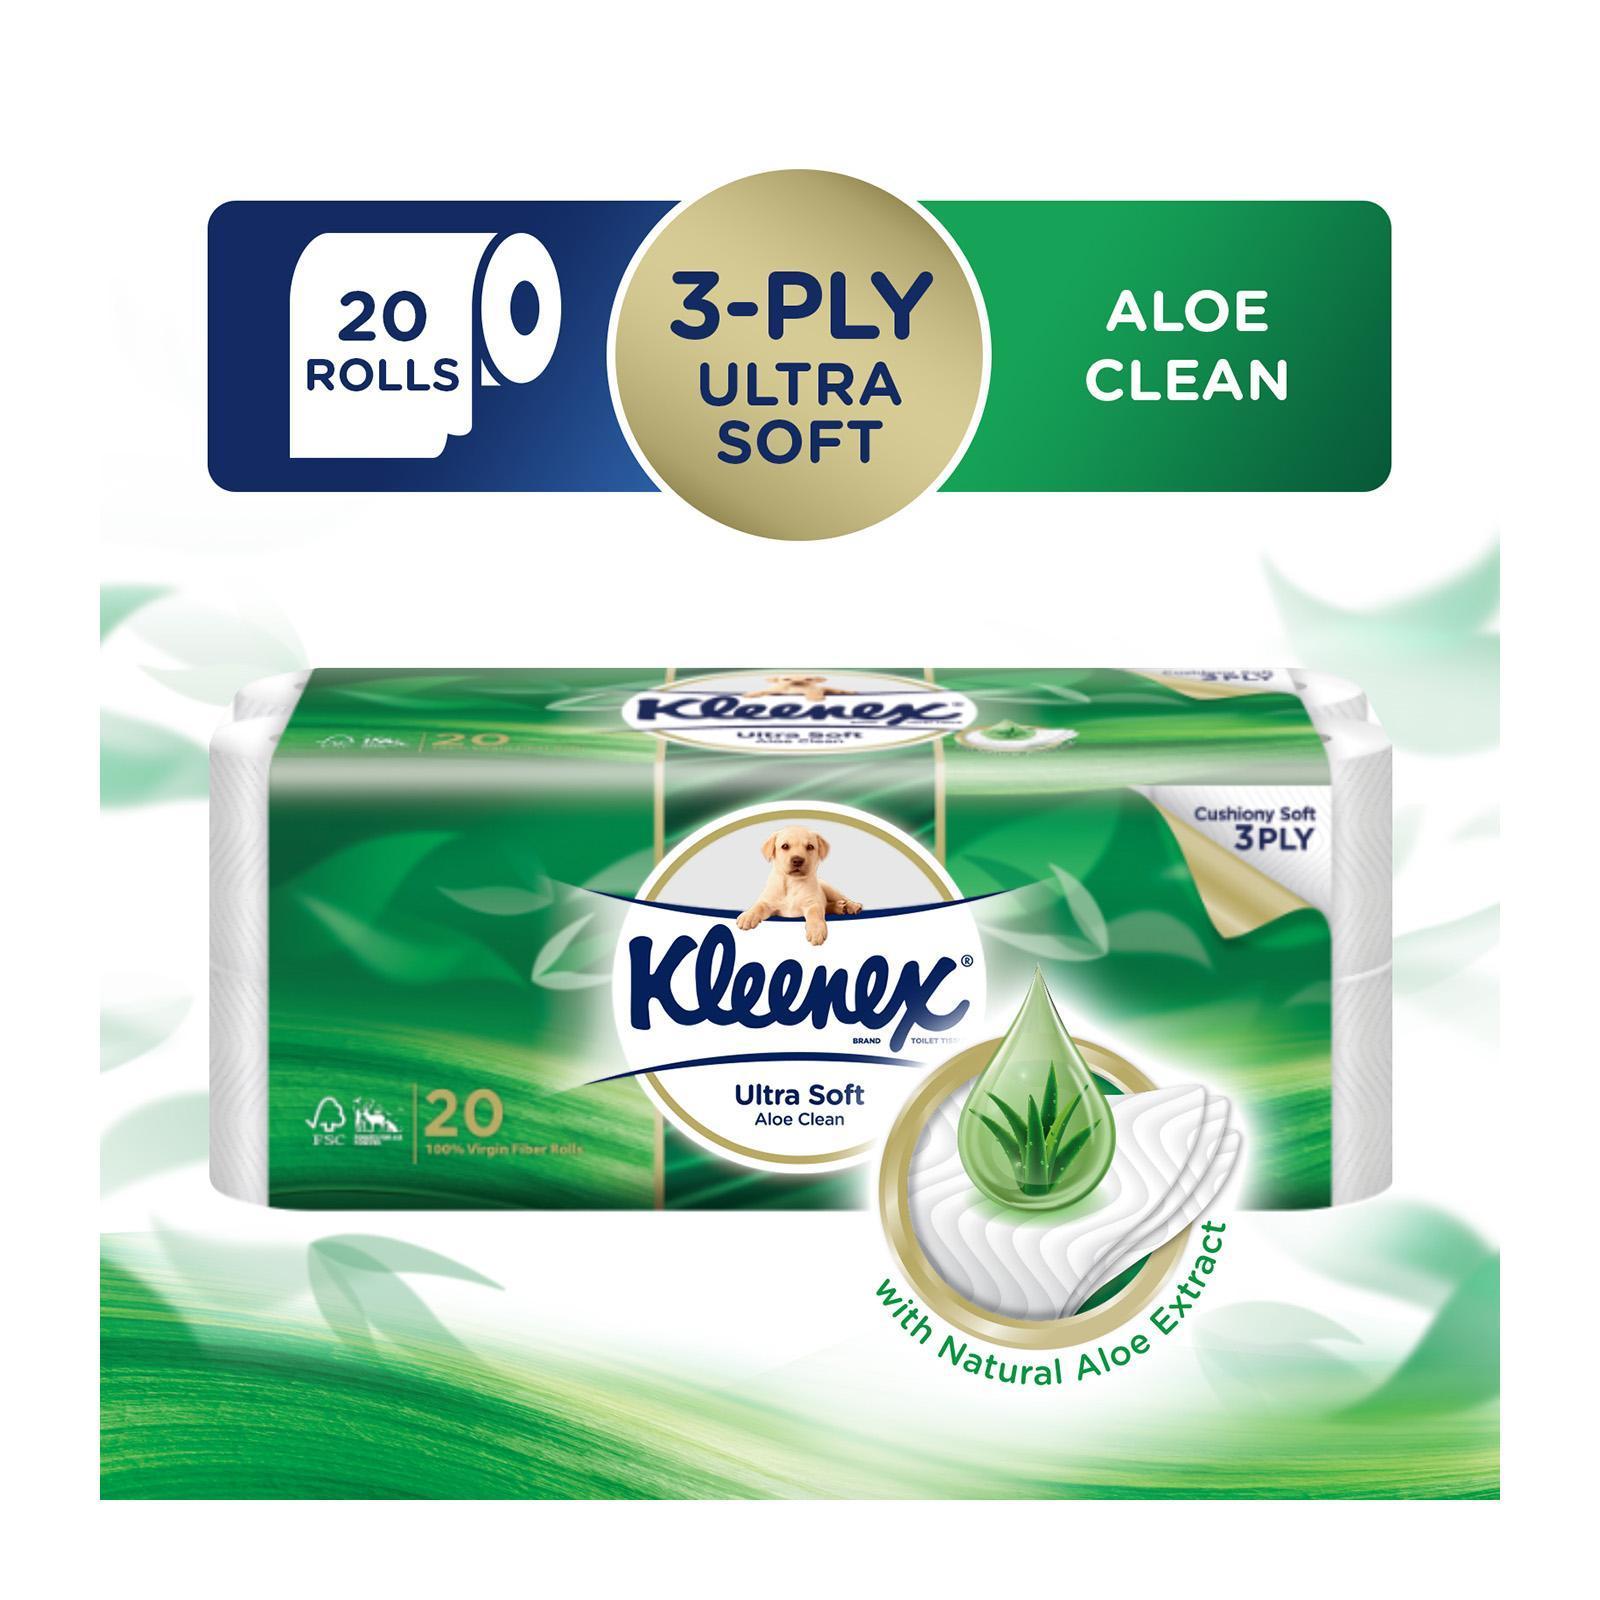 Kleenex Ultra Soft Aloe Clean 3-Ply Toilet Tissue FOC 8 Kleenex Pocket Pack